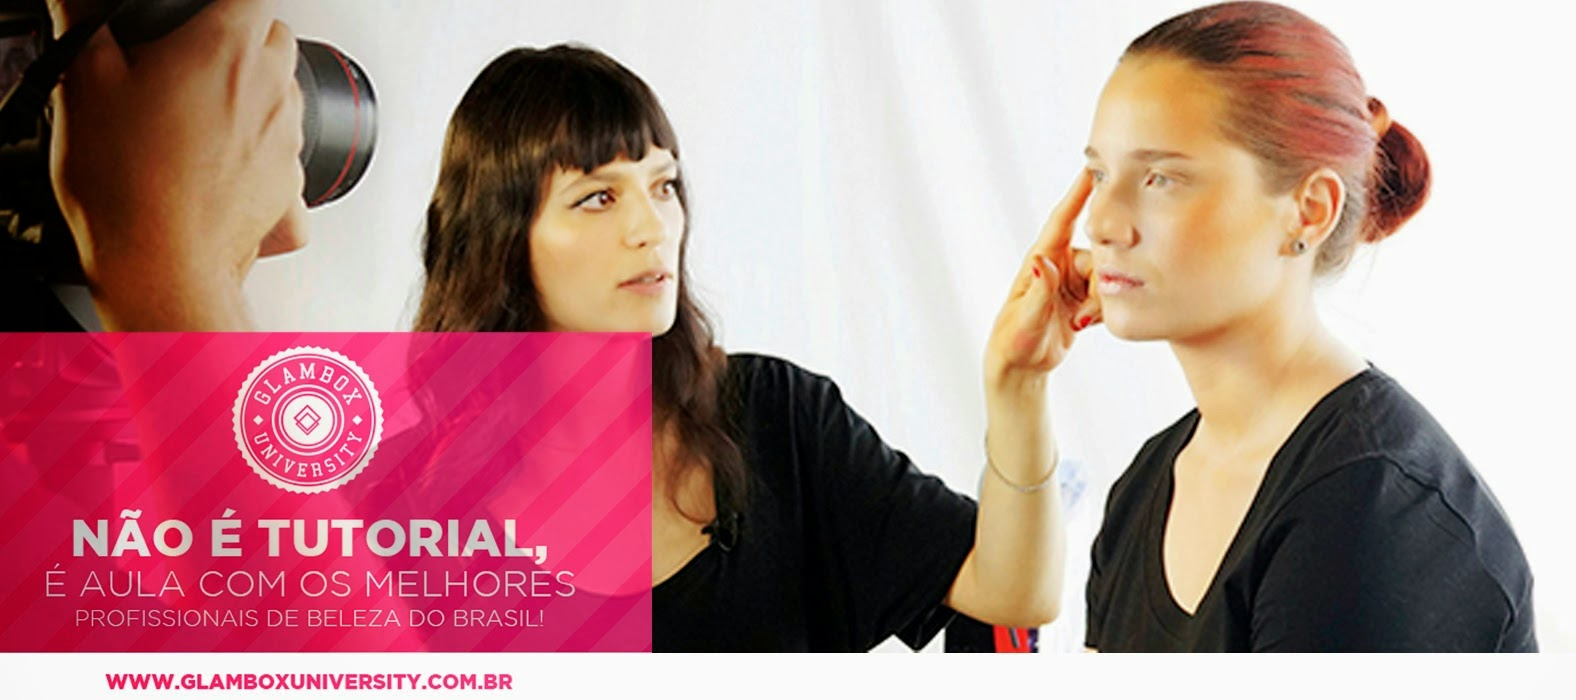 Glambox University, curso, maquiagem, online